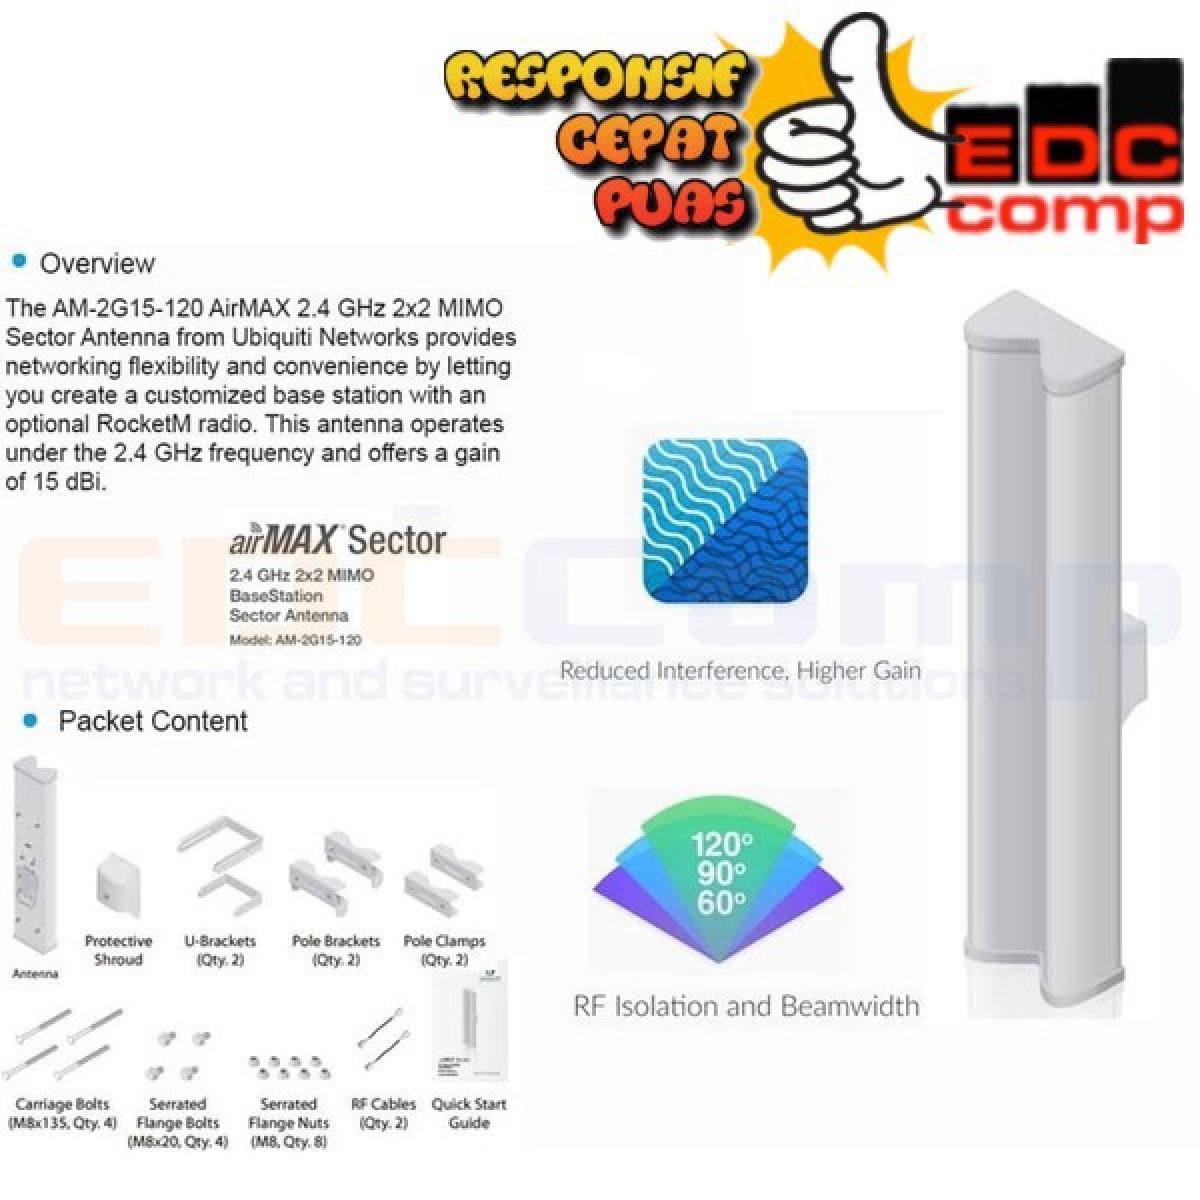 Antena Sectoral Airmax 2G15-120 (AM-2G15-120) Ubiquiti Networks - EdcComp